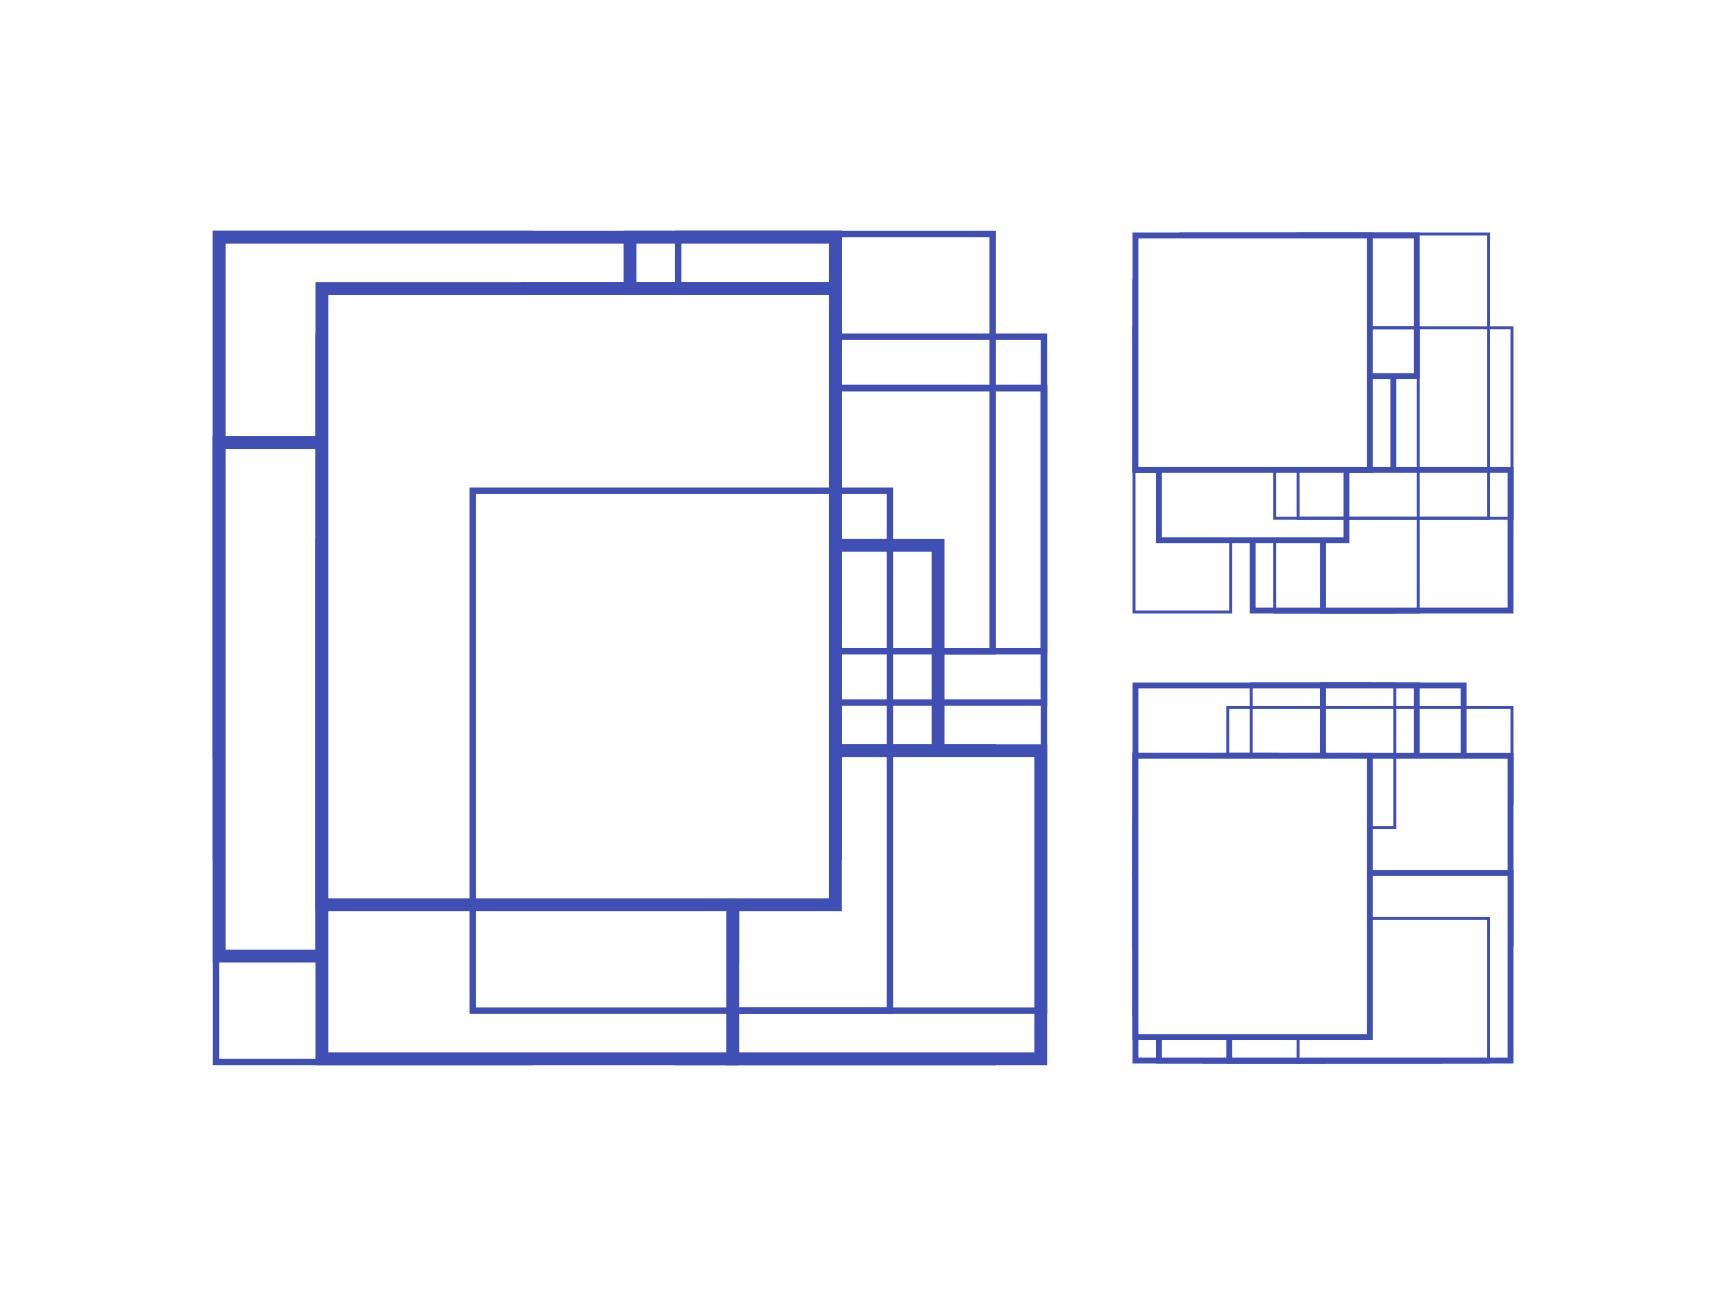 plan35a.jpg